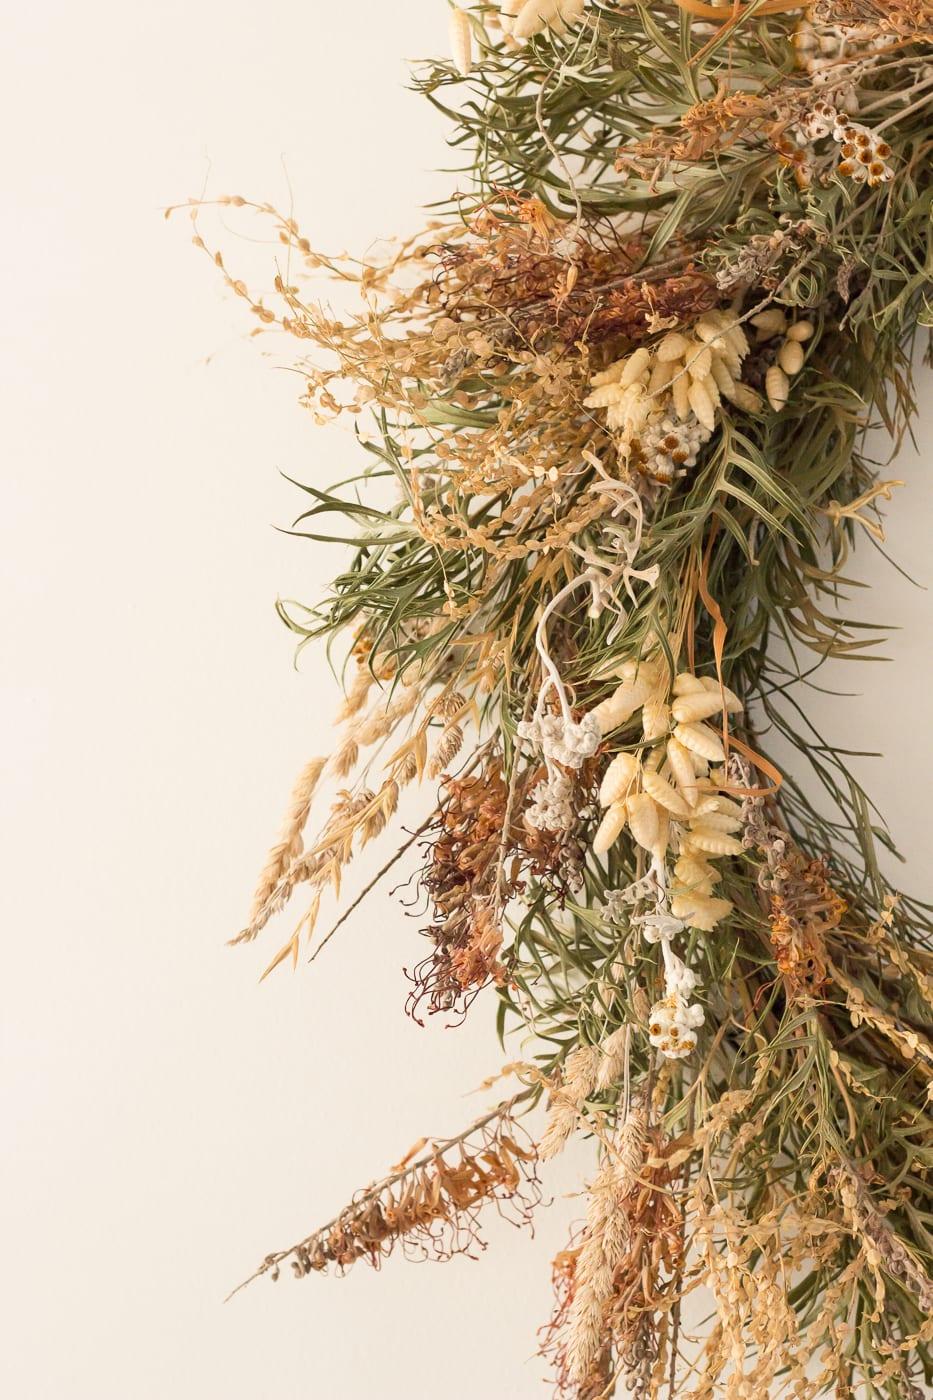 Banksia wreath2 (1 of 1)